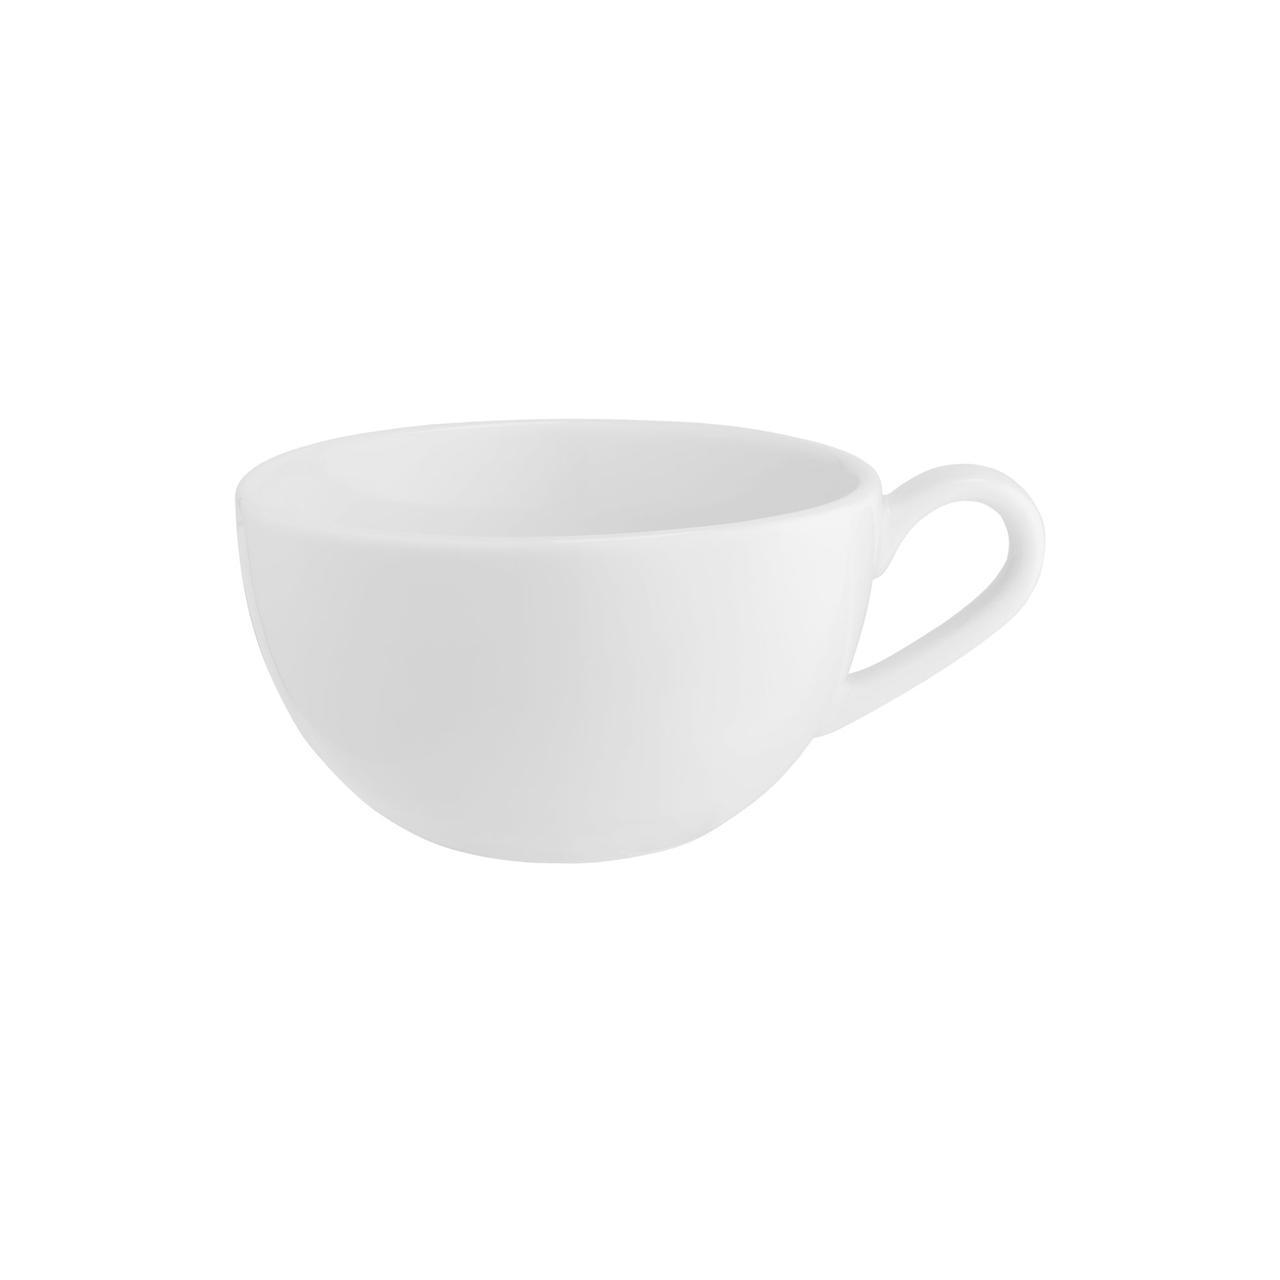 Чашка Classic, малая (артикул 12802.80)